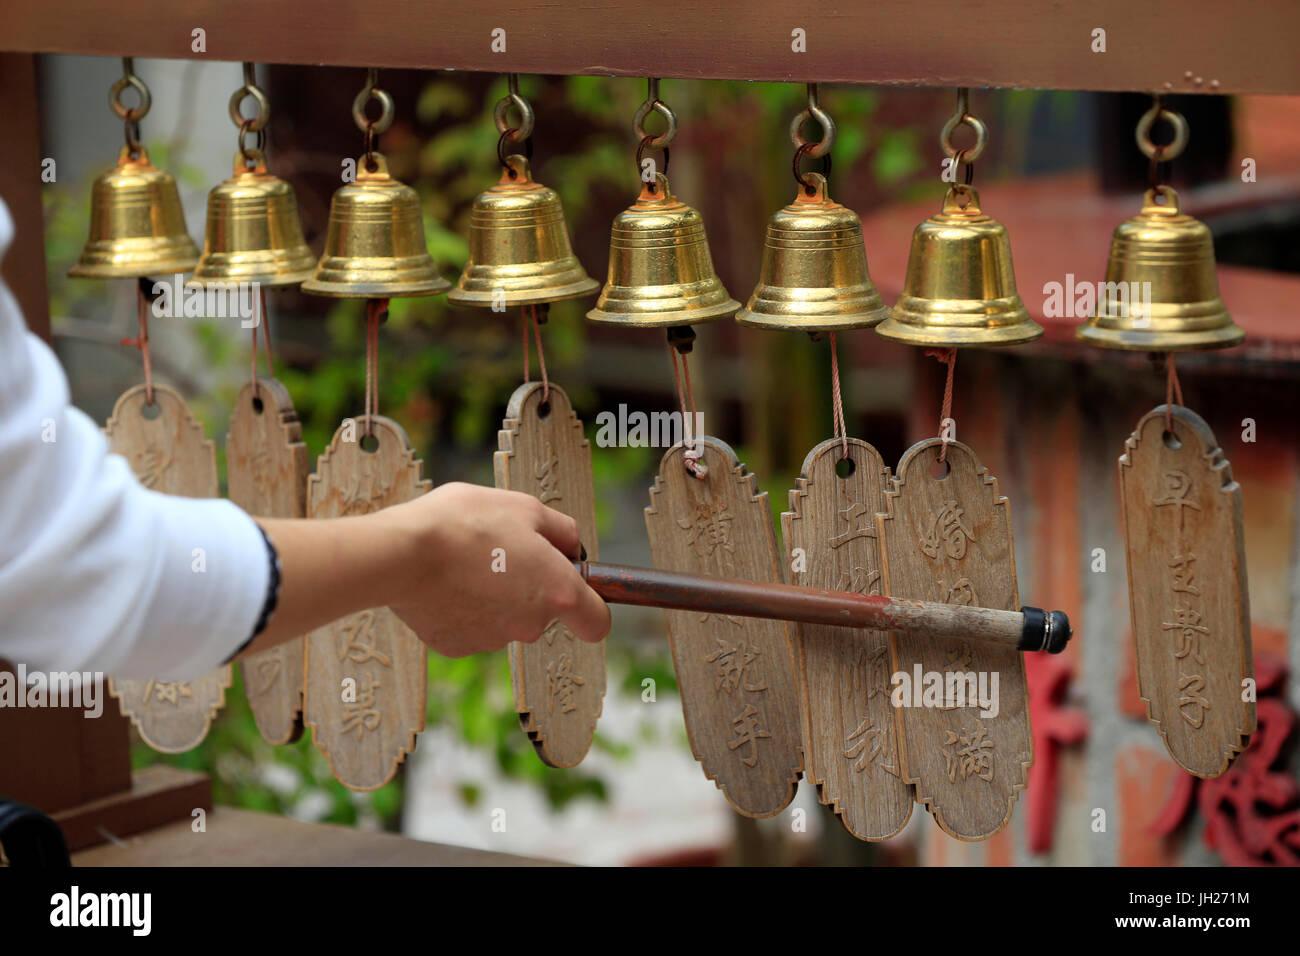 Thian Hock Keng Temple.  Wishing bells.  Singapore. - Stock Image